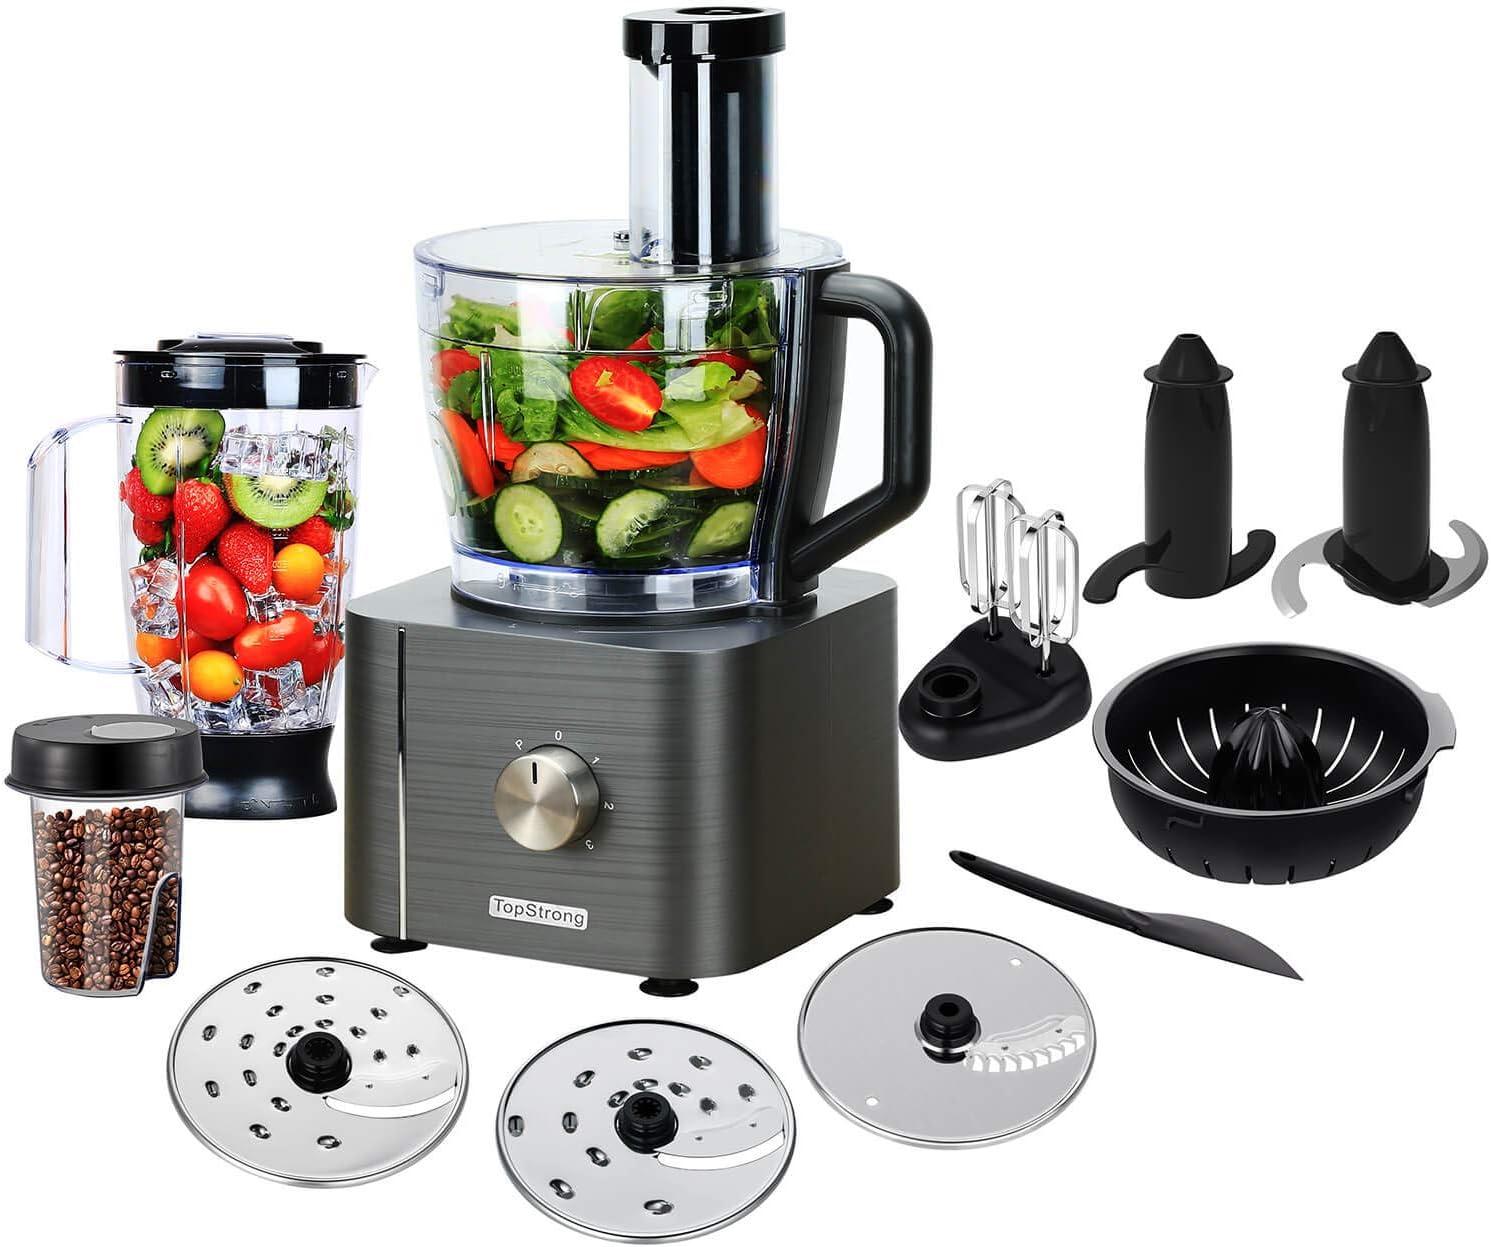 TopStrong Procesador de Alimentos,11 en 1 Robot de Cocina Compacto,1100W, Capacidad 3.2 Litros,MultiTalent con accesorios (Licuadora, Picadora, Multi Mezclador con Cuchilla para Masa)